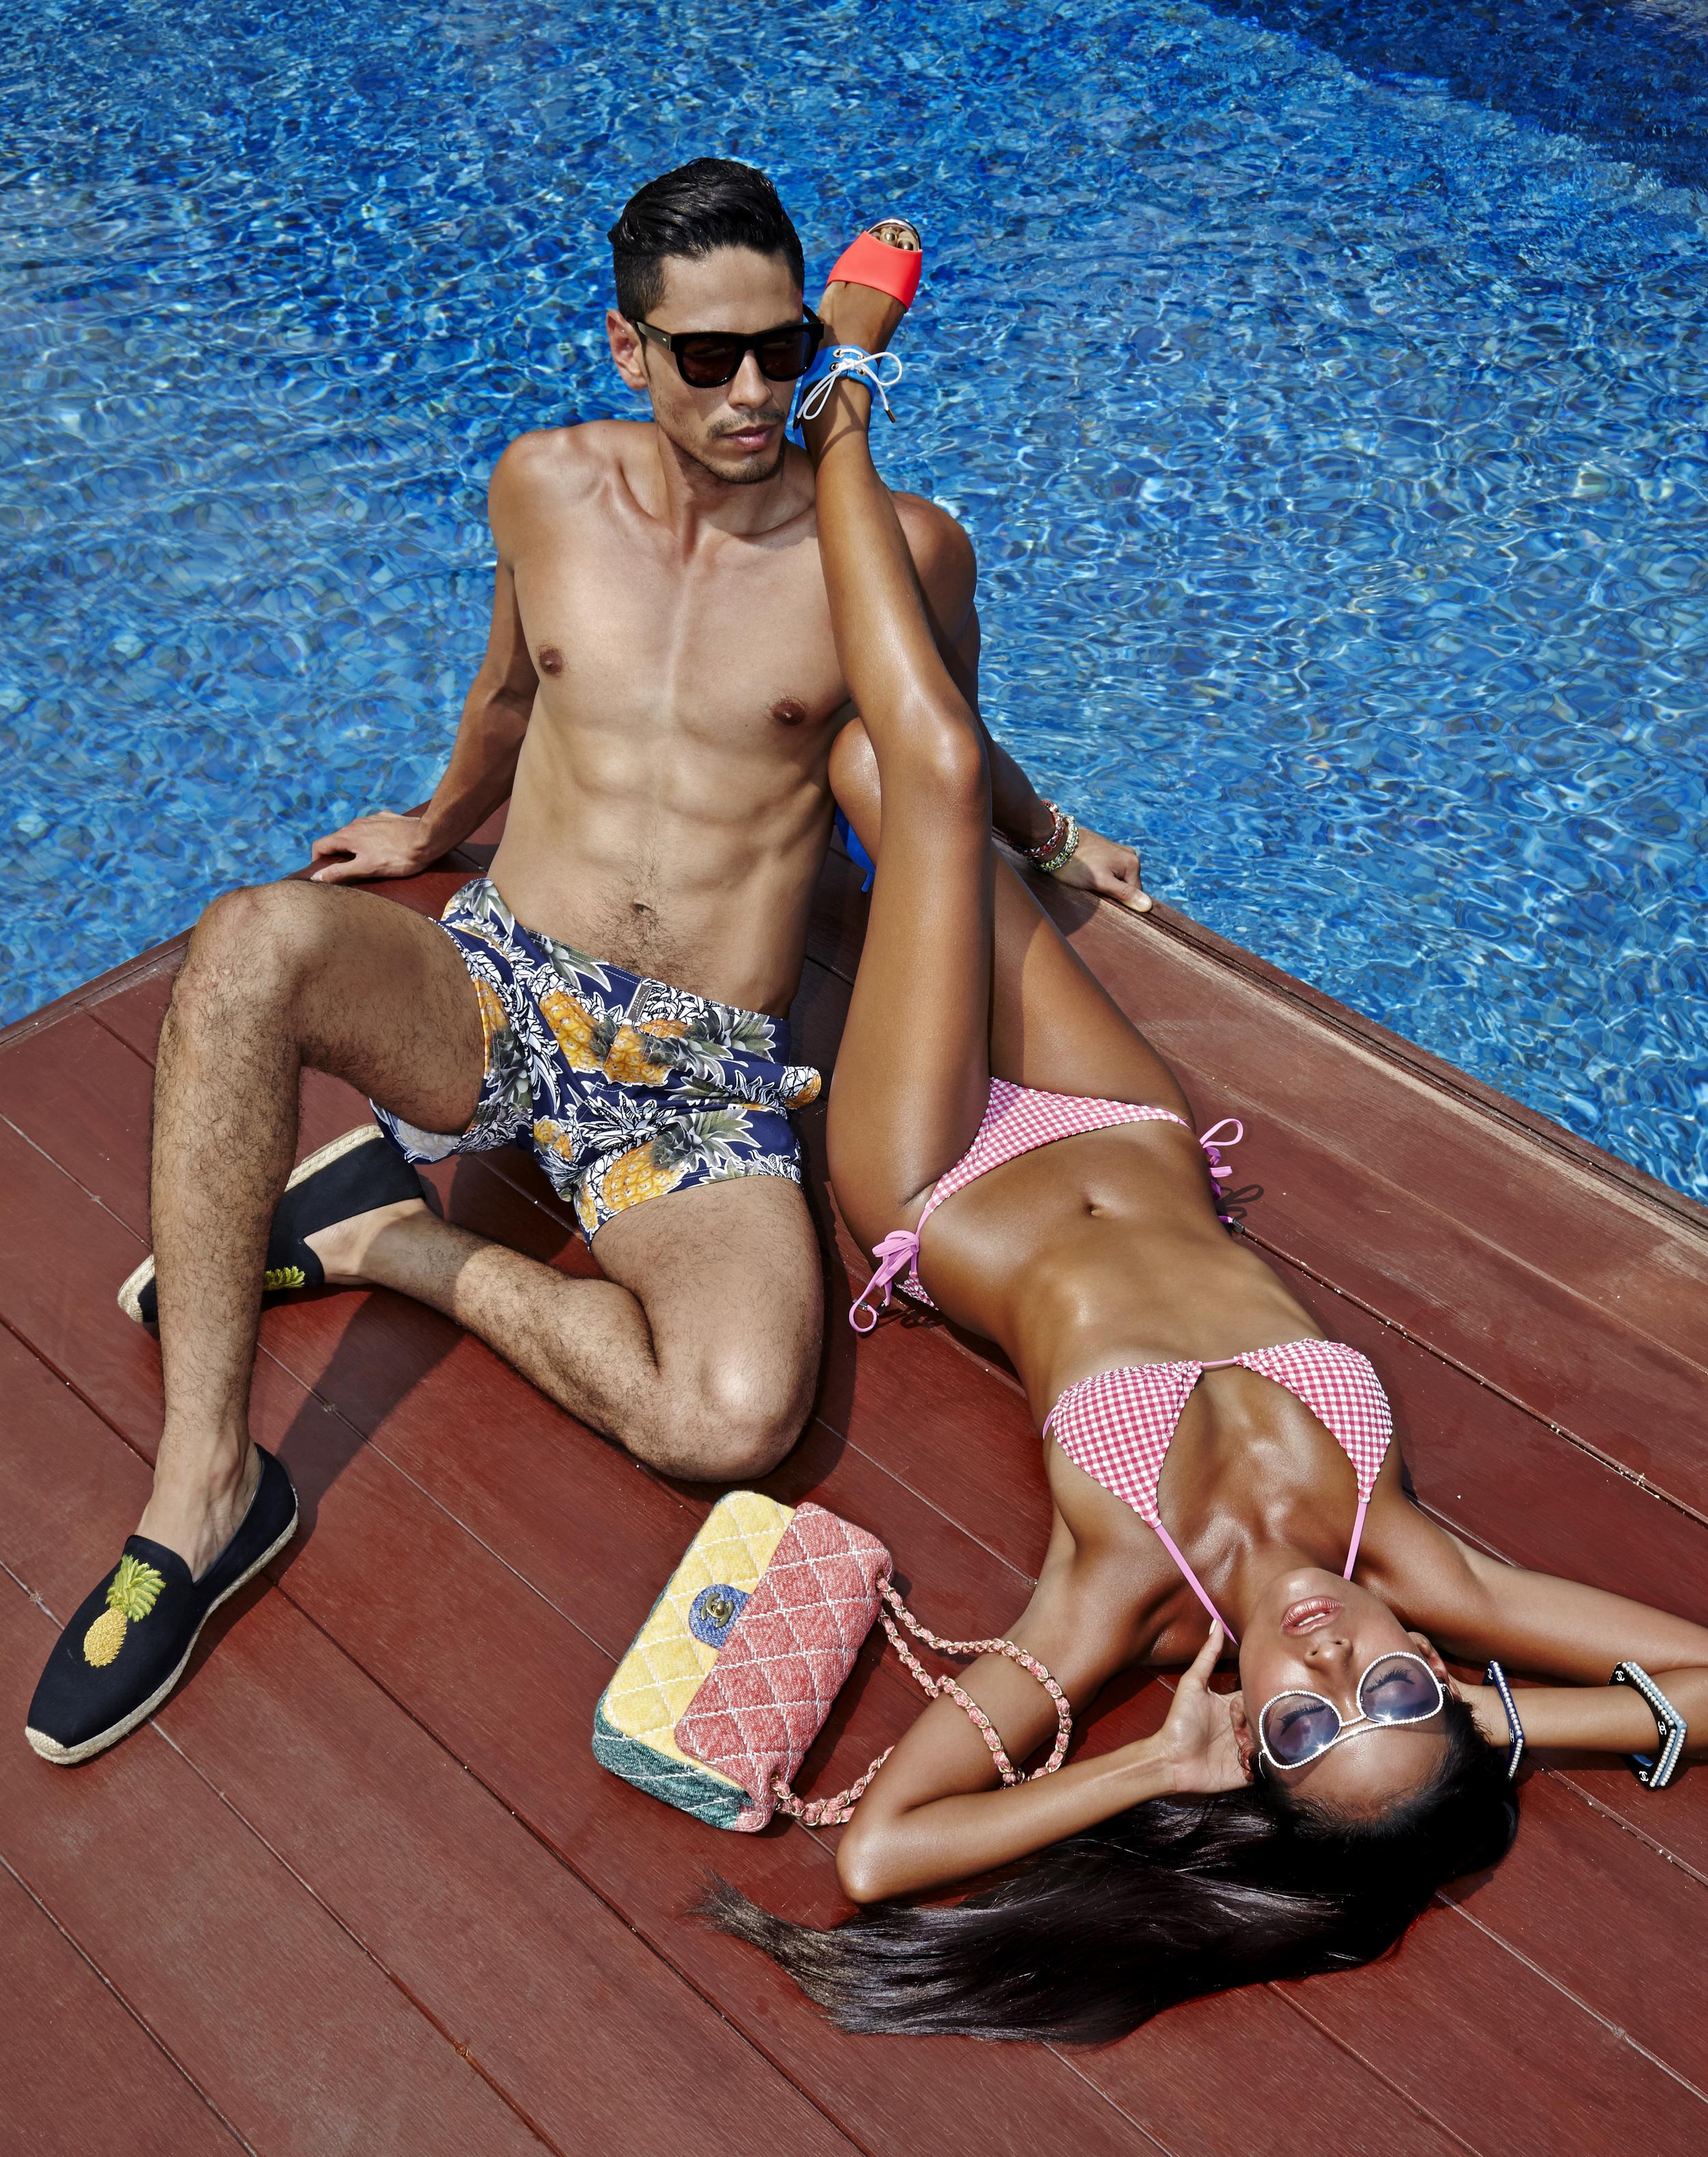 Female : Bikini : Vilebrequin / Bag, sunglasses and accessories : CHANEL / shoes : Christian Louboutin  Male : Trunks : Vilebrequin / shoes : Christian Louboutin